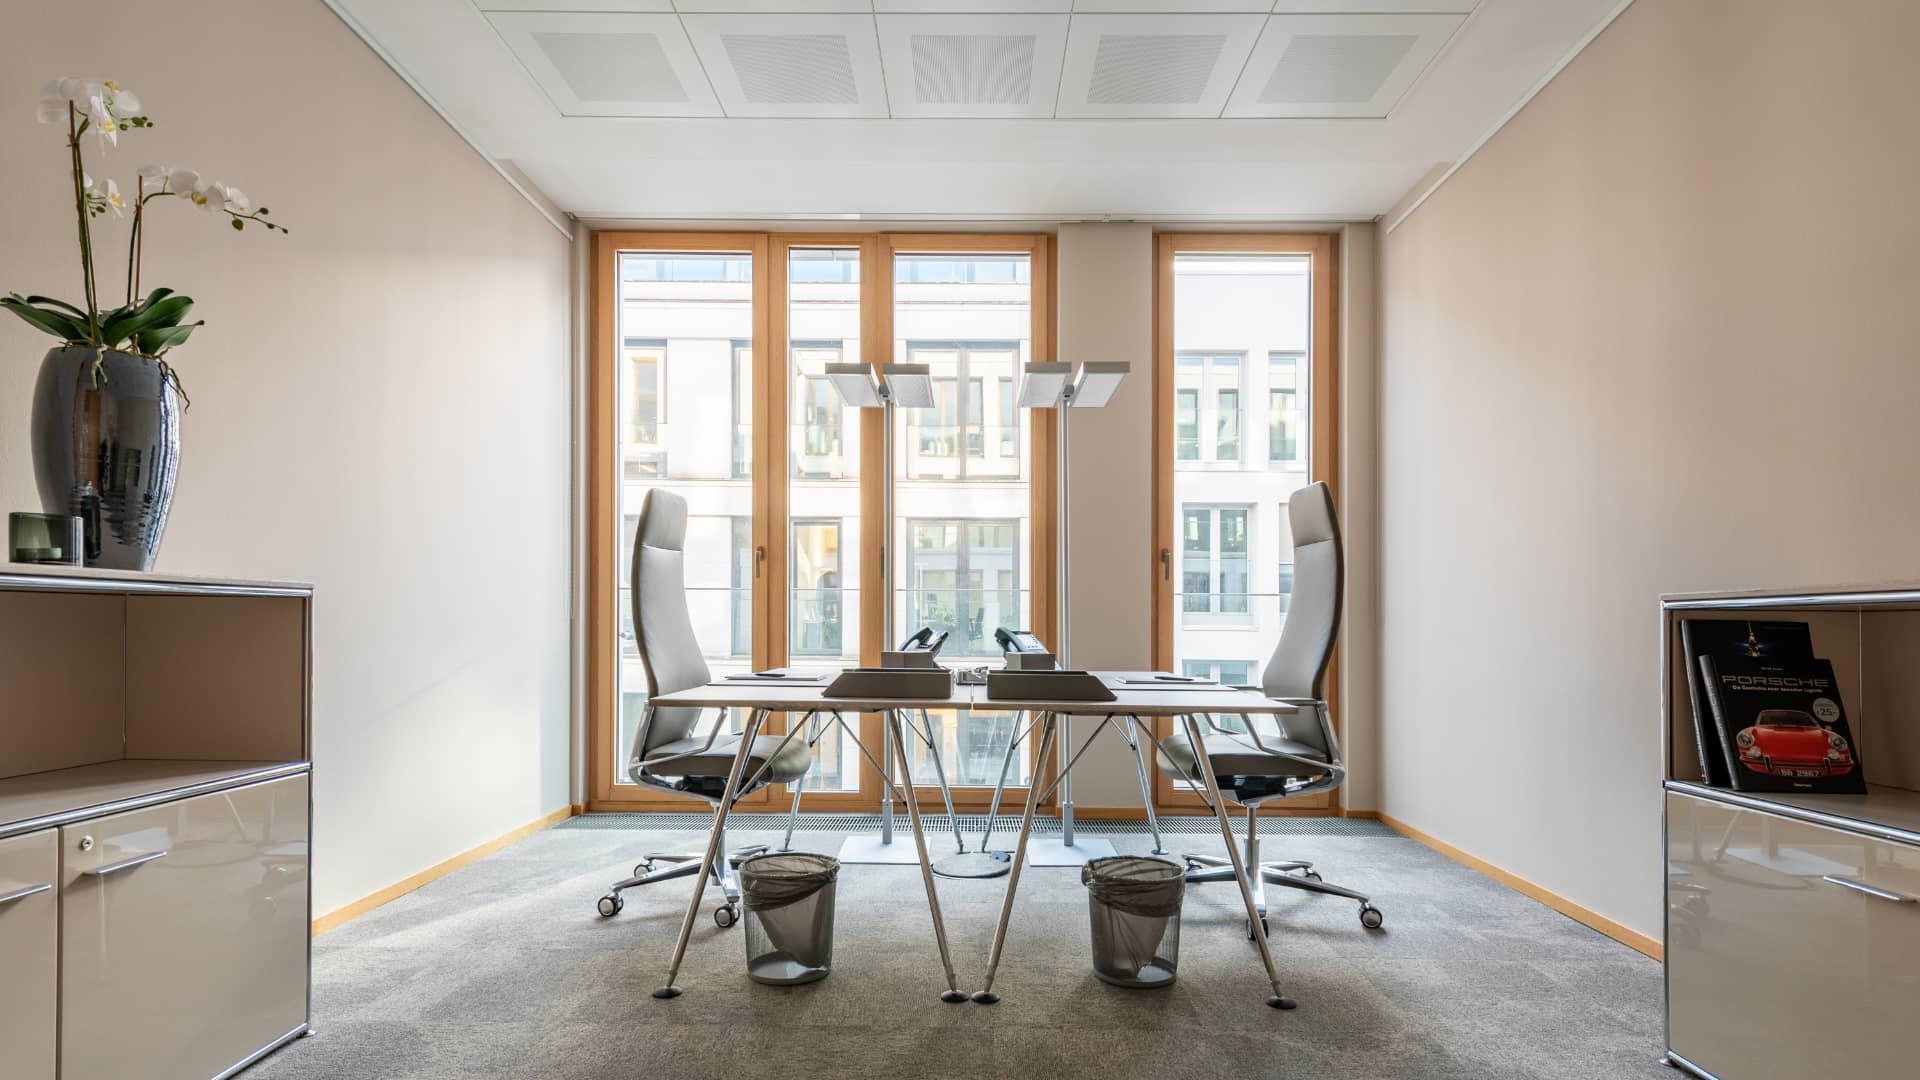 Neuer Wall meeting room 2